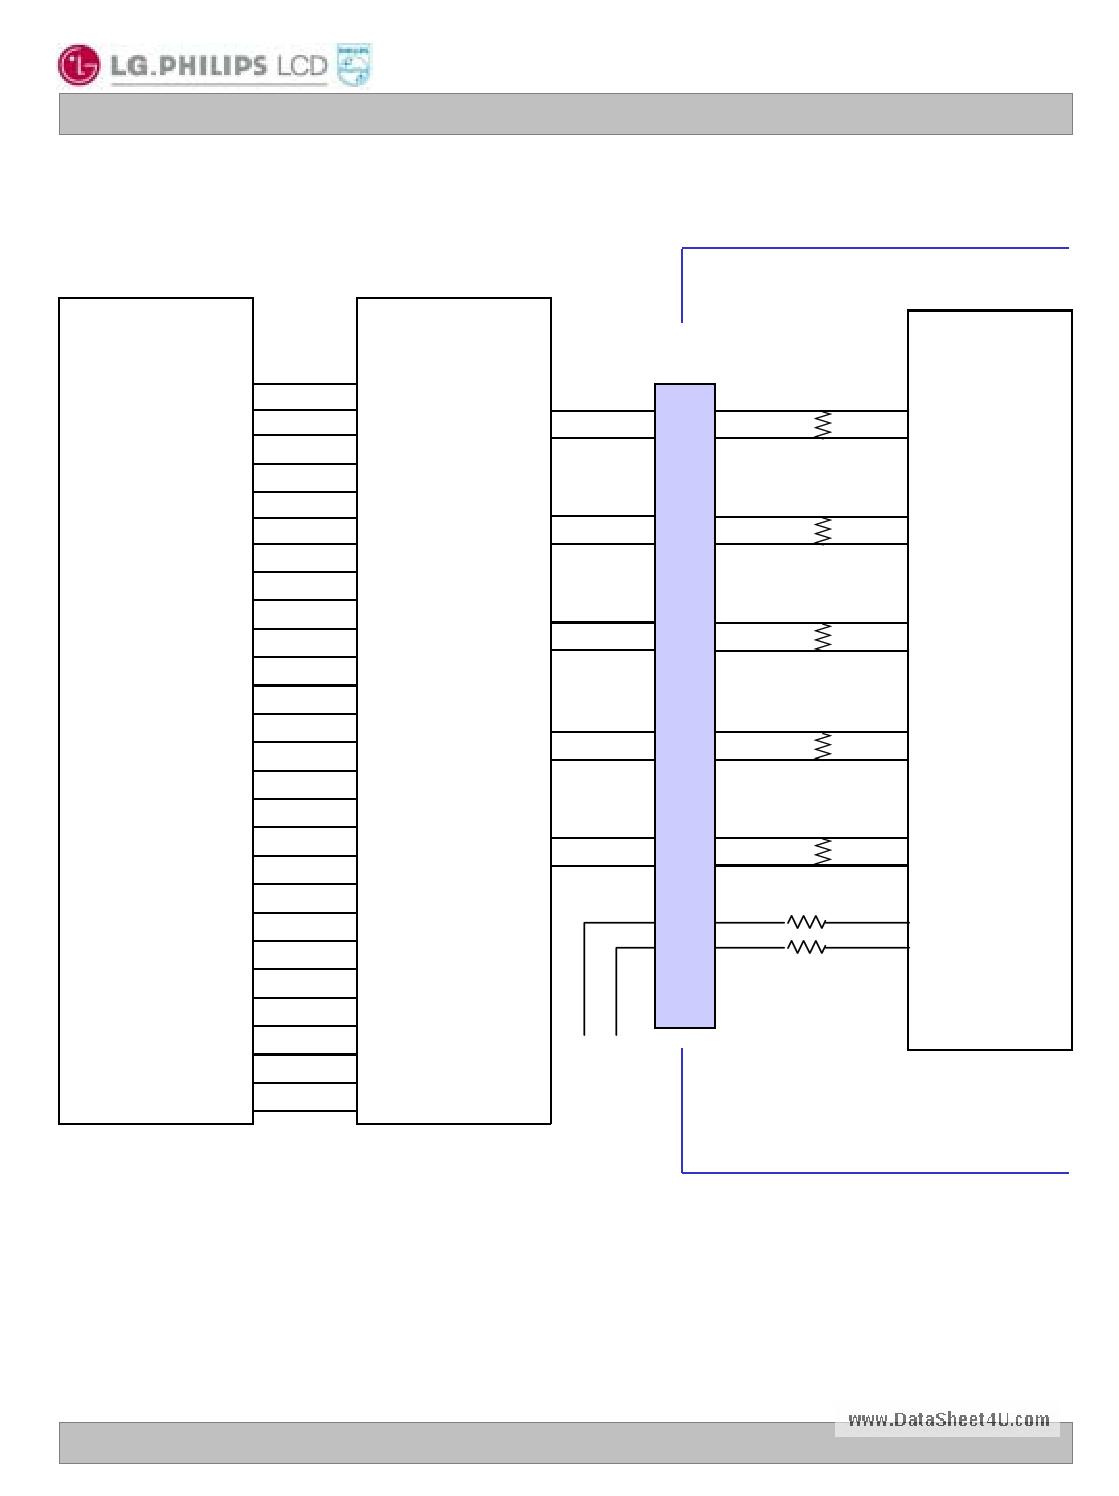 LC320W01 arduino